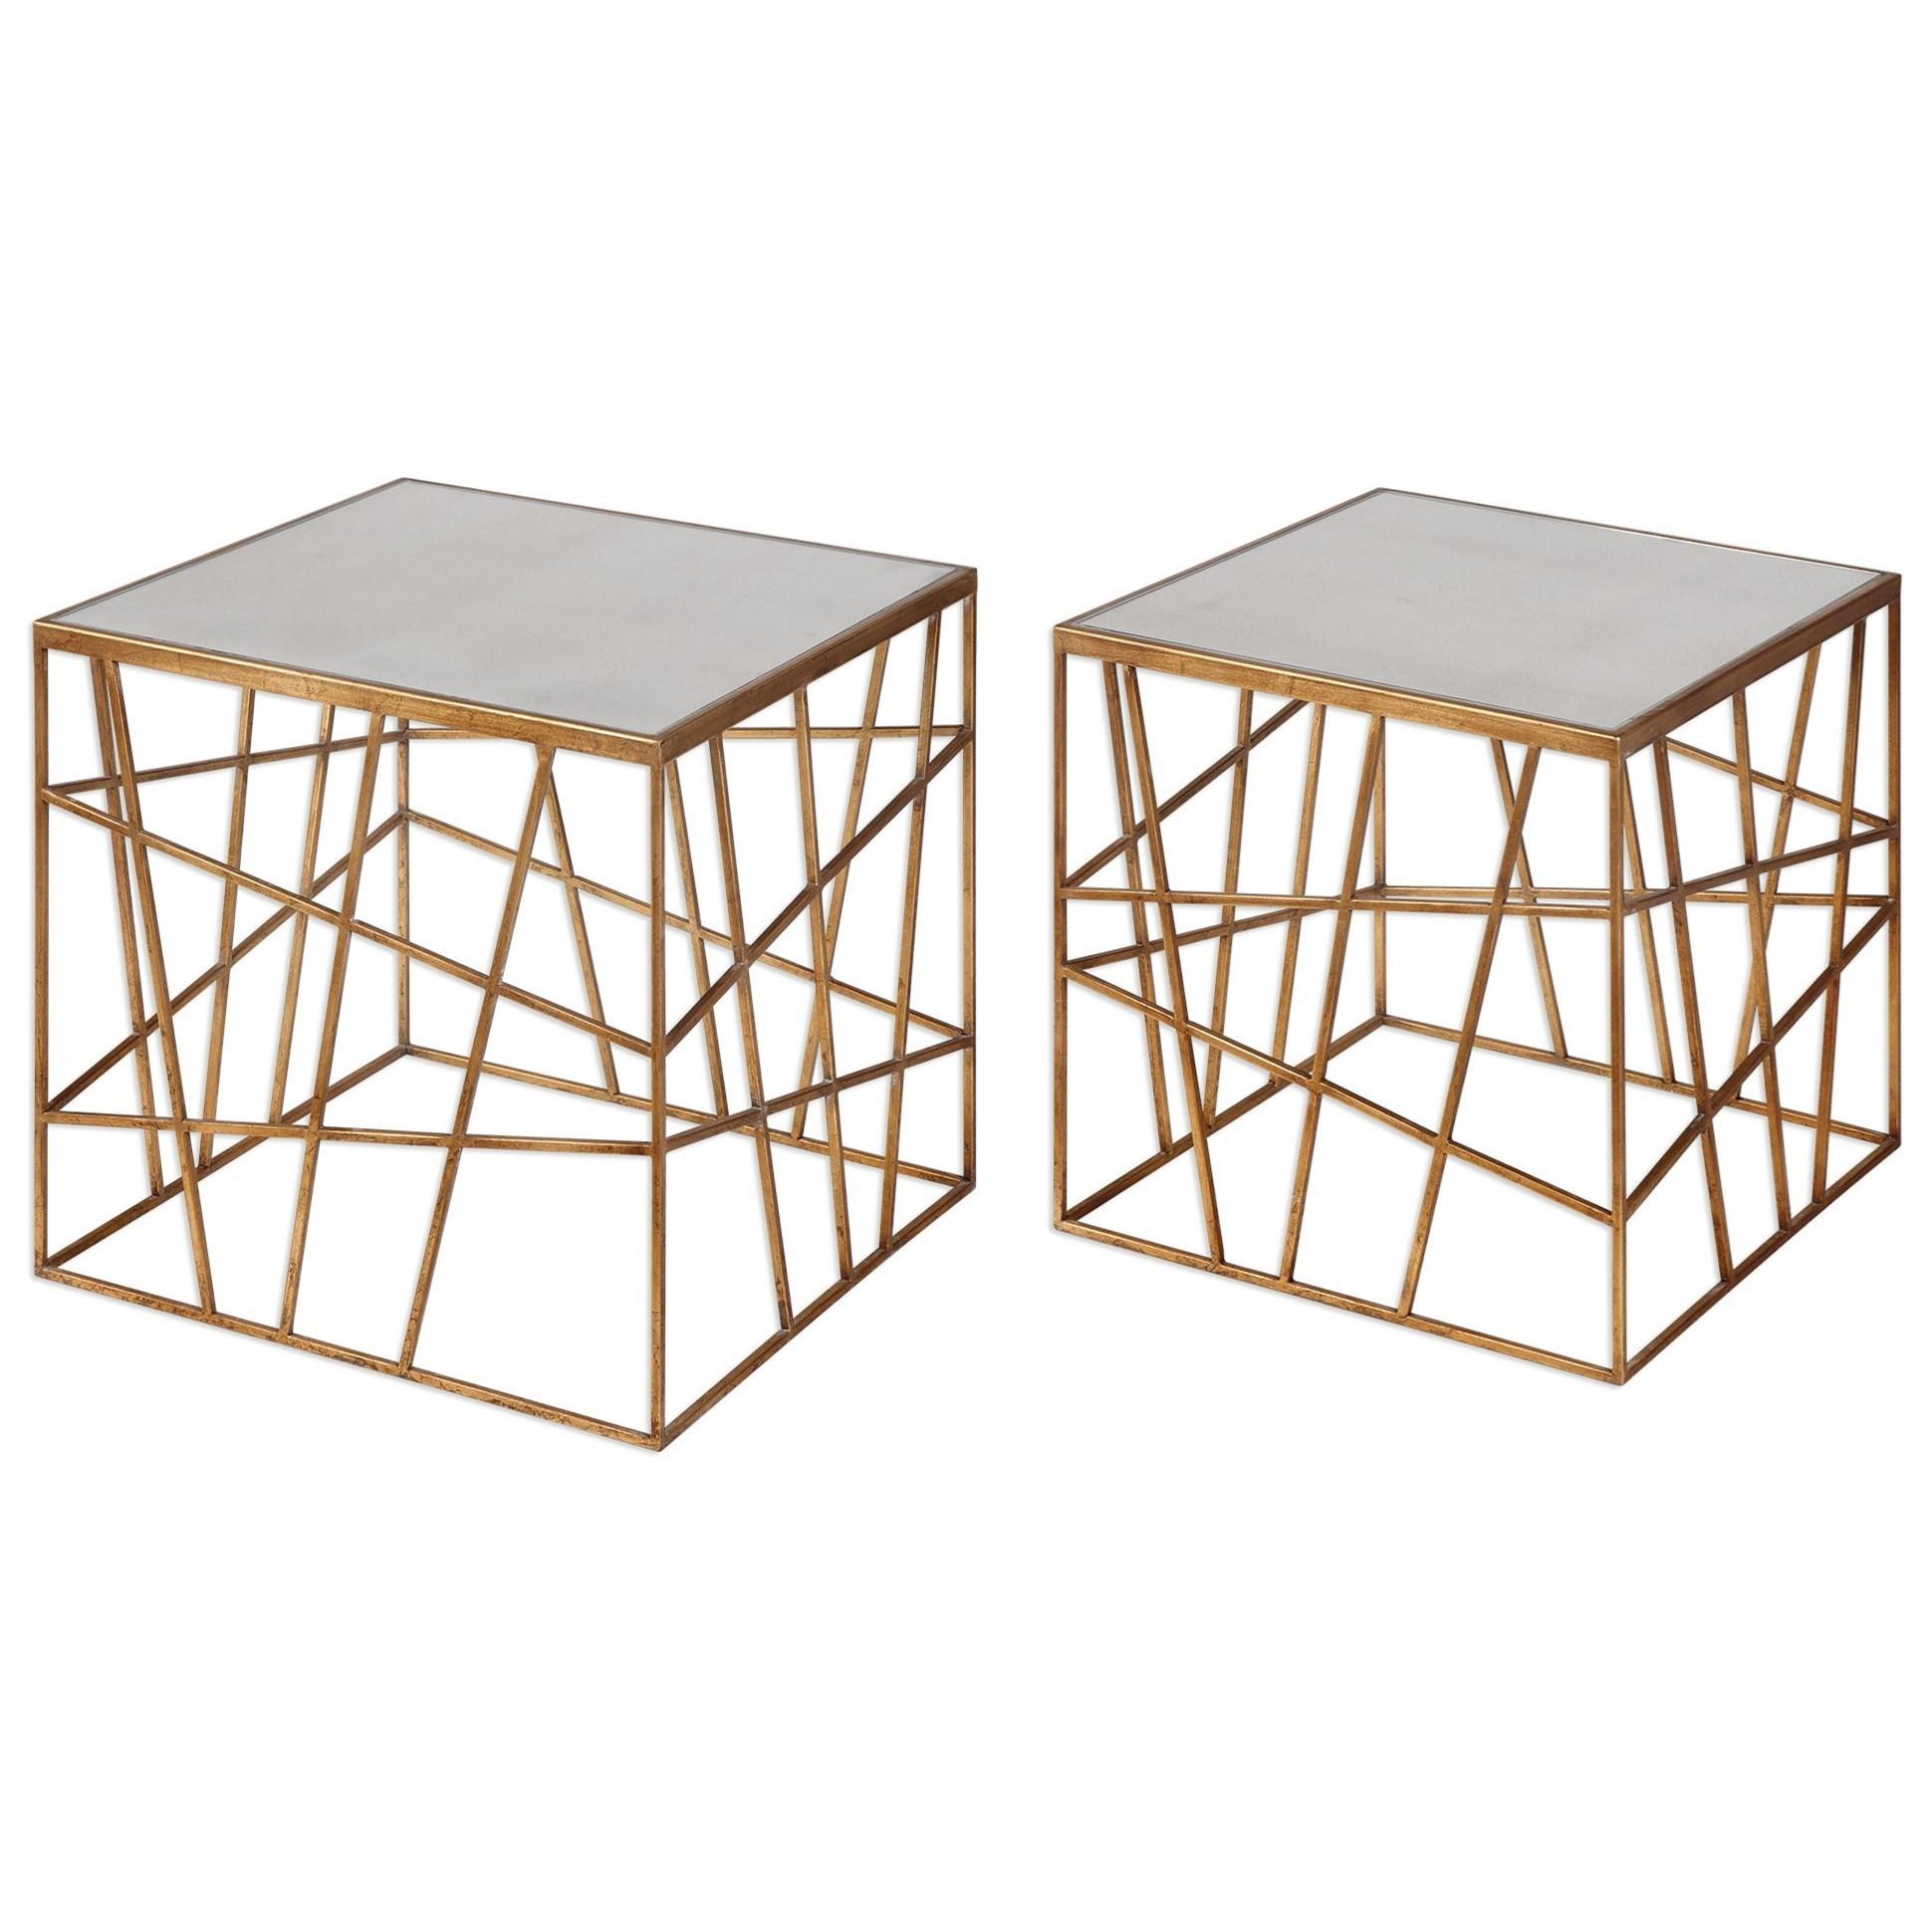 Uttermost Accent Furniture  Karkin Gold Accent Tables (Set of 2) - Item Number: 24687